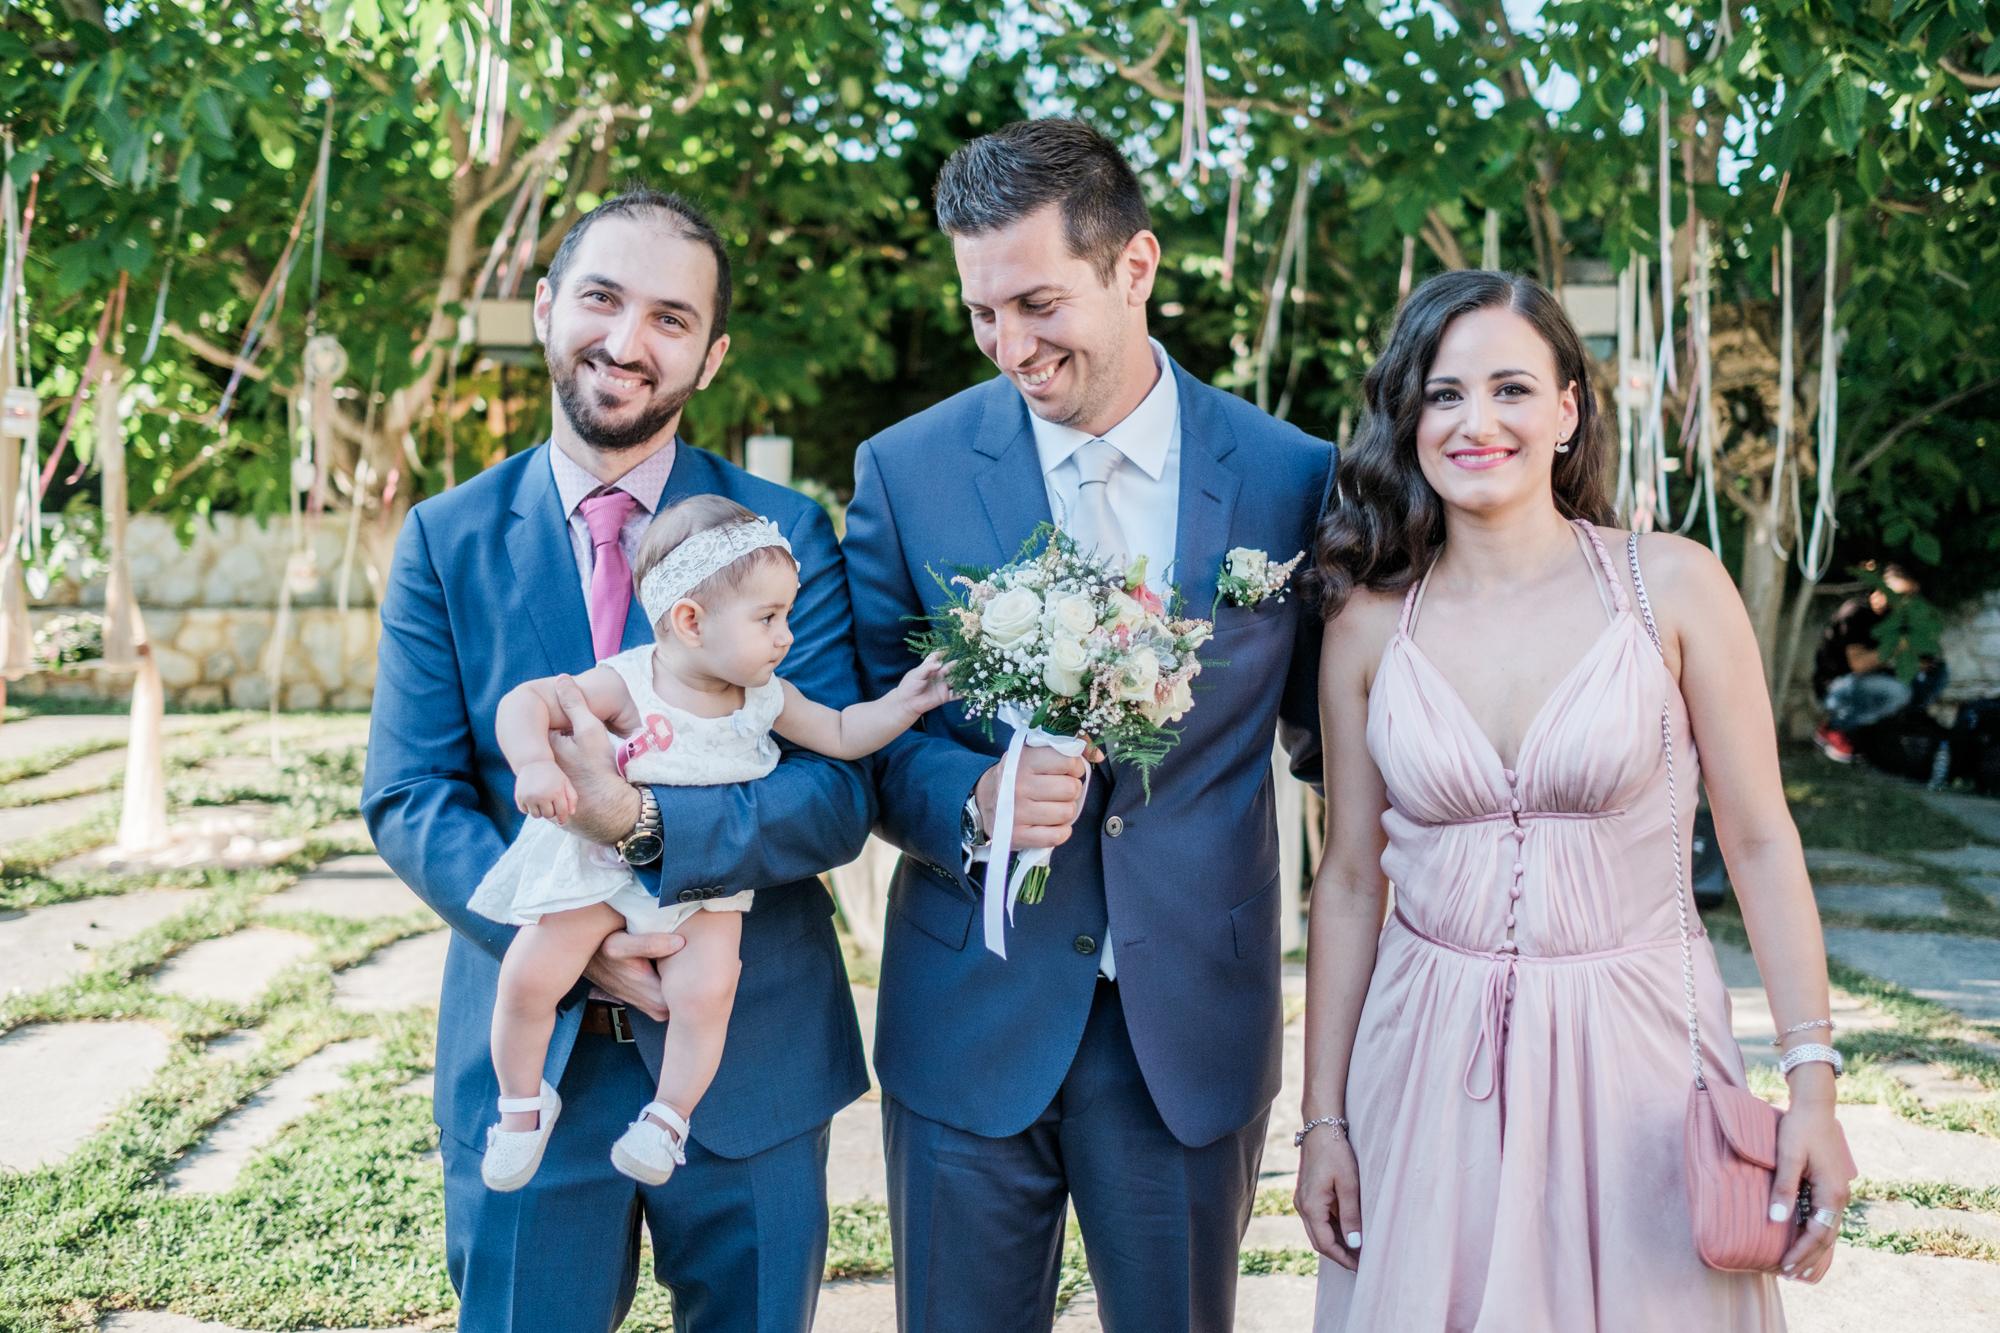 weddingday-39